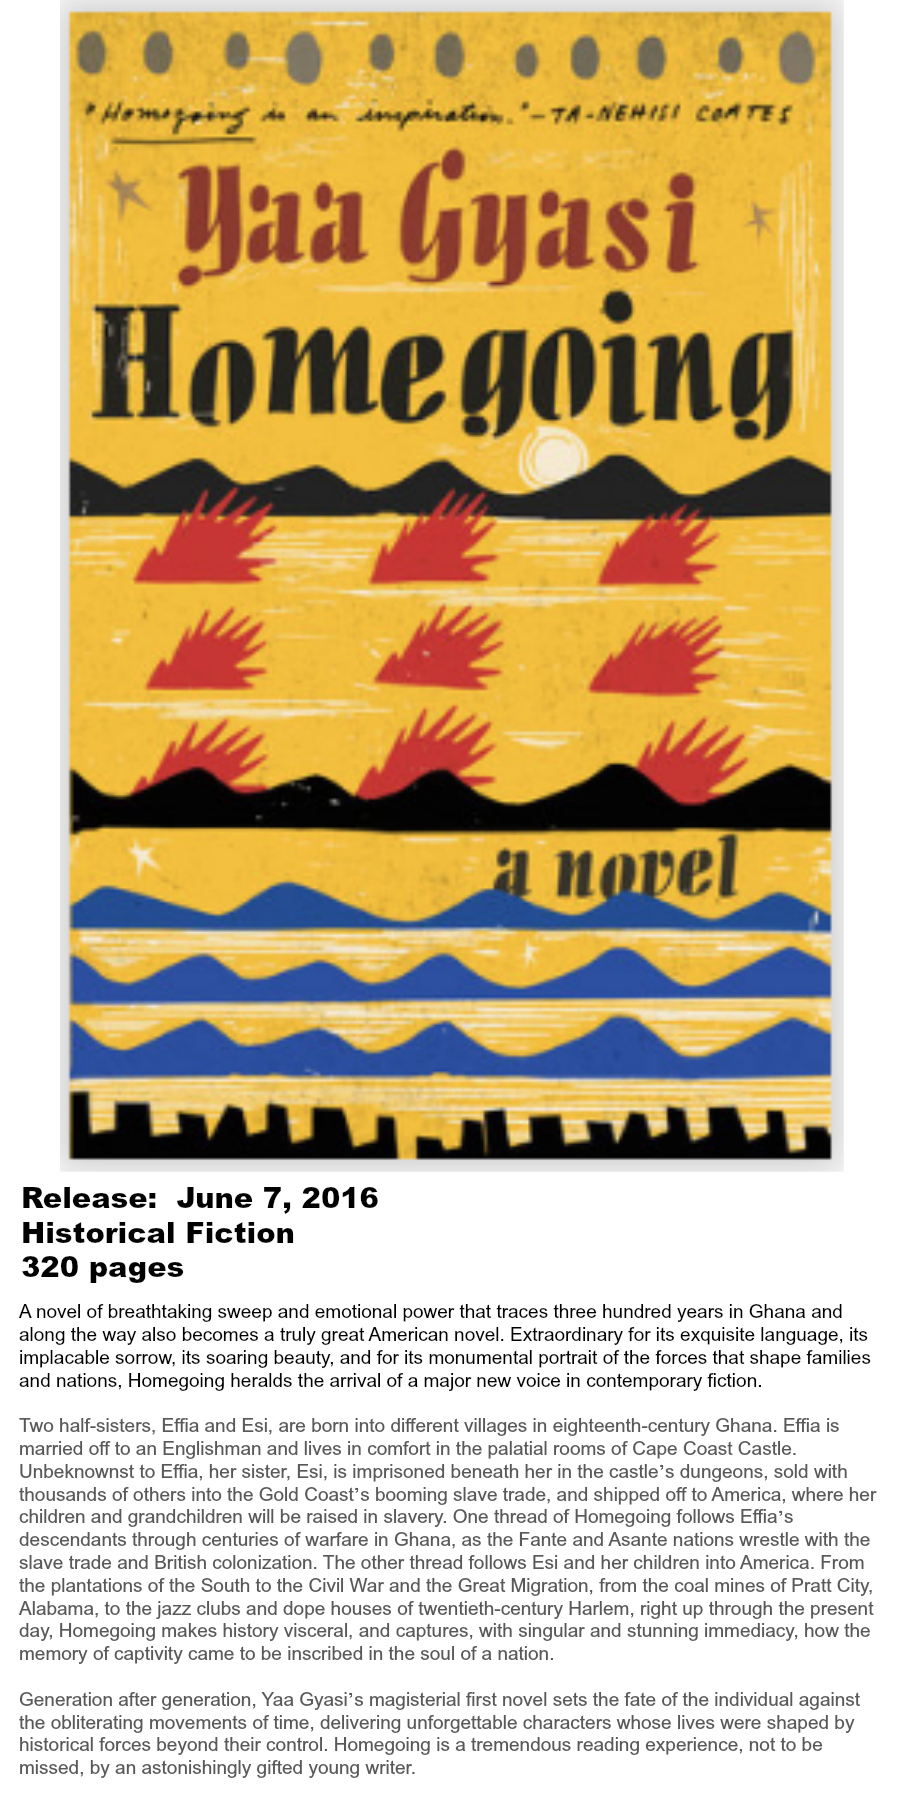 Must-read Books of Summer 2016 - Homegoing Yaa Gyasi